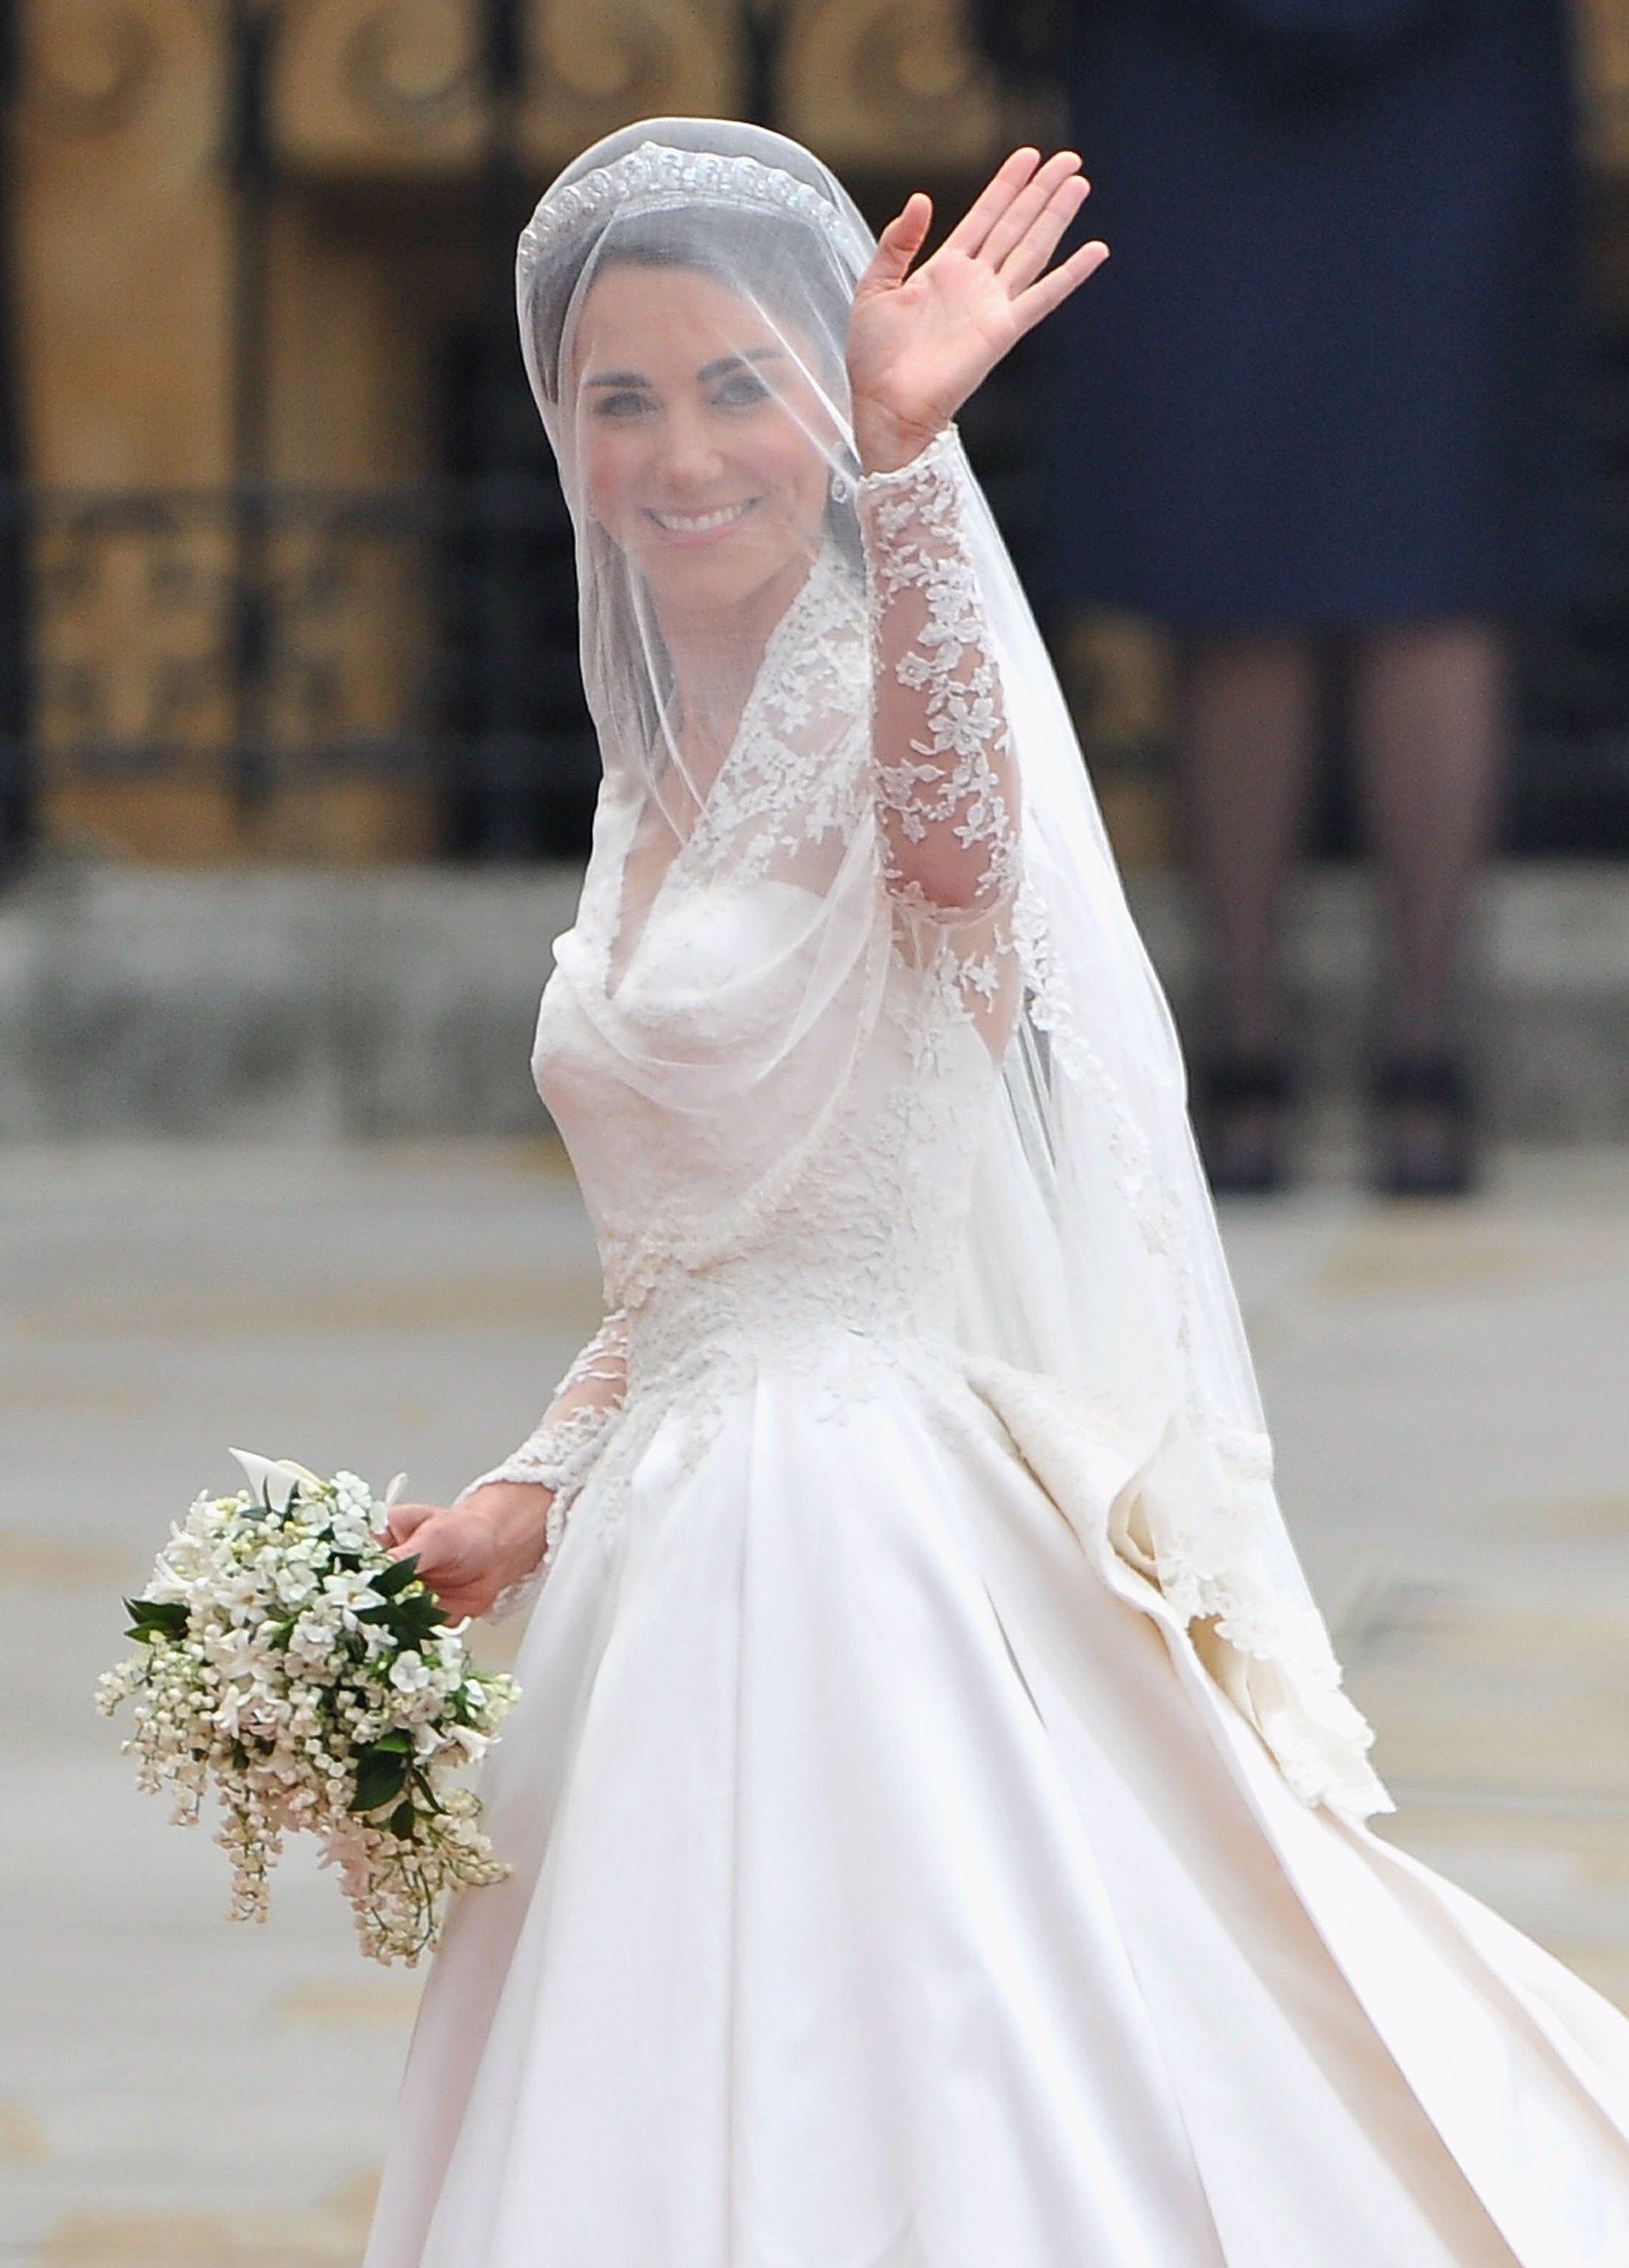 Vestidos de novia mas famosos del mundo